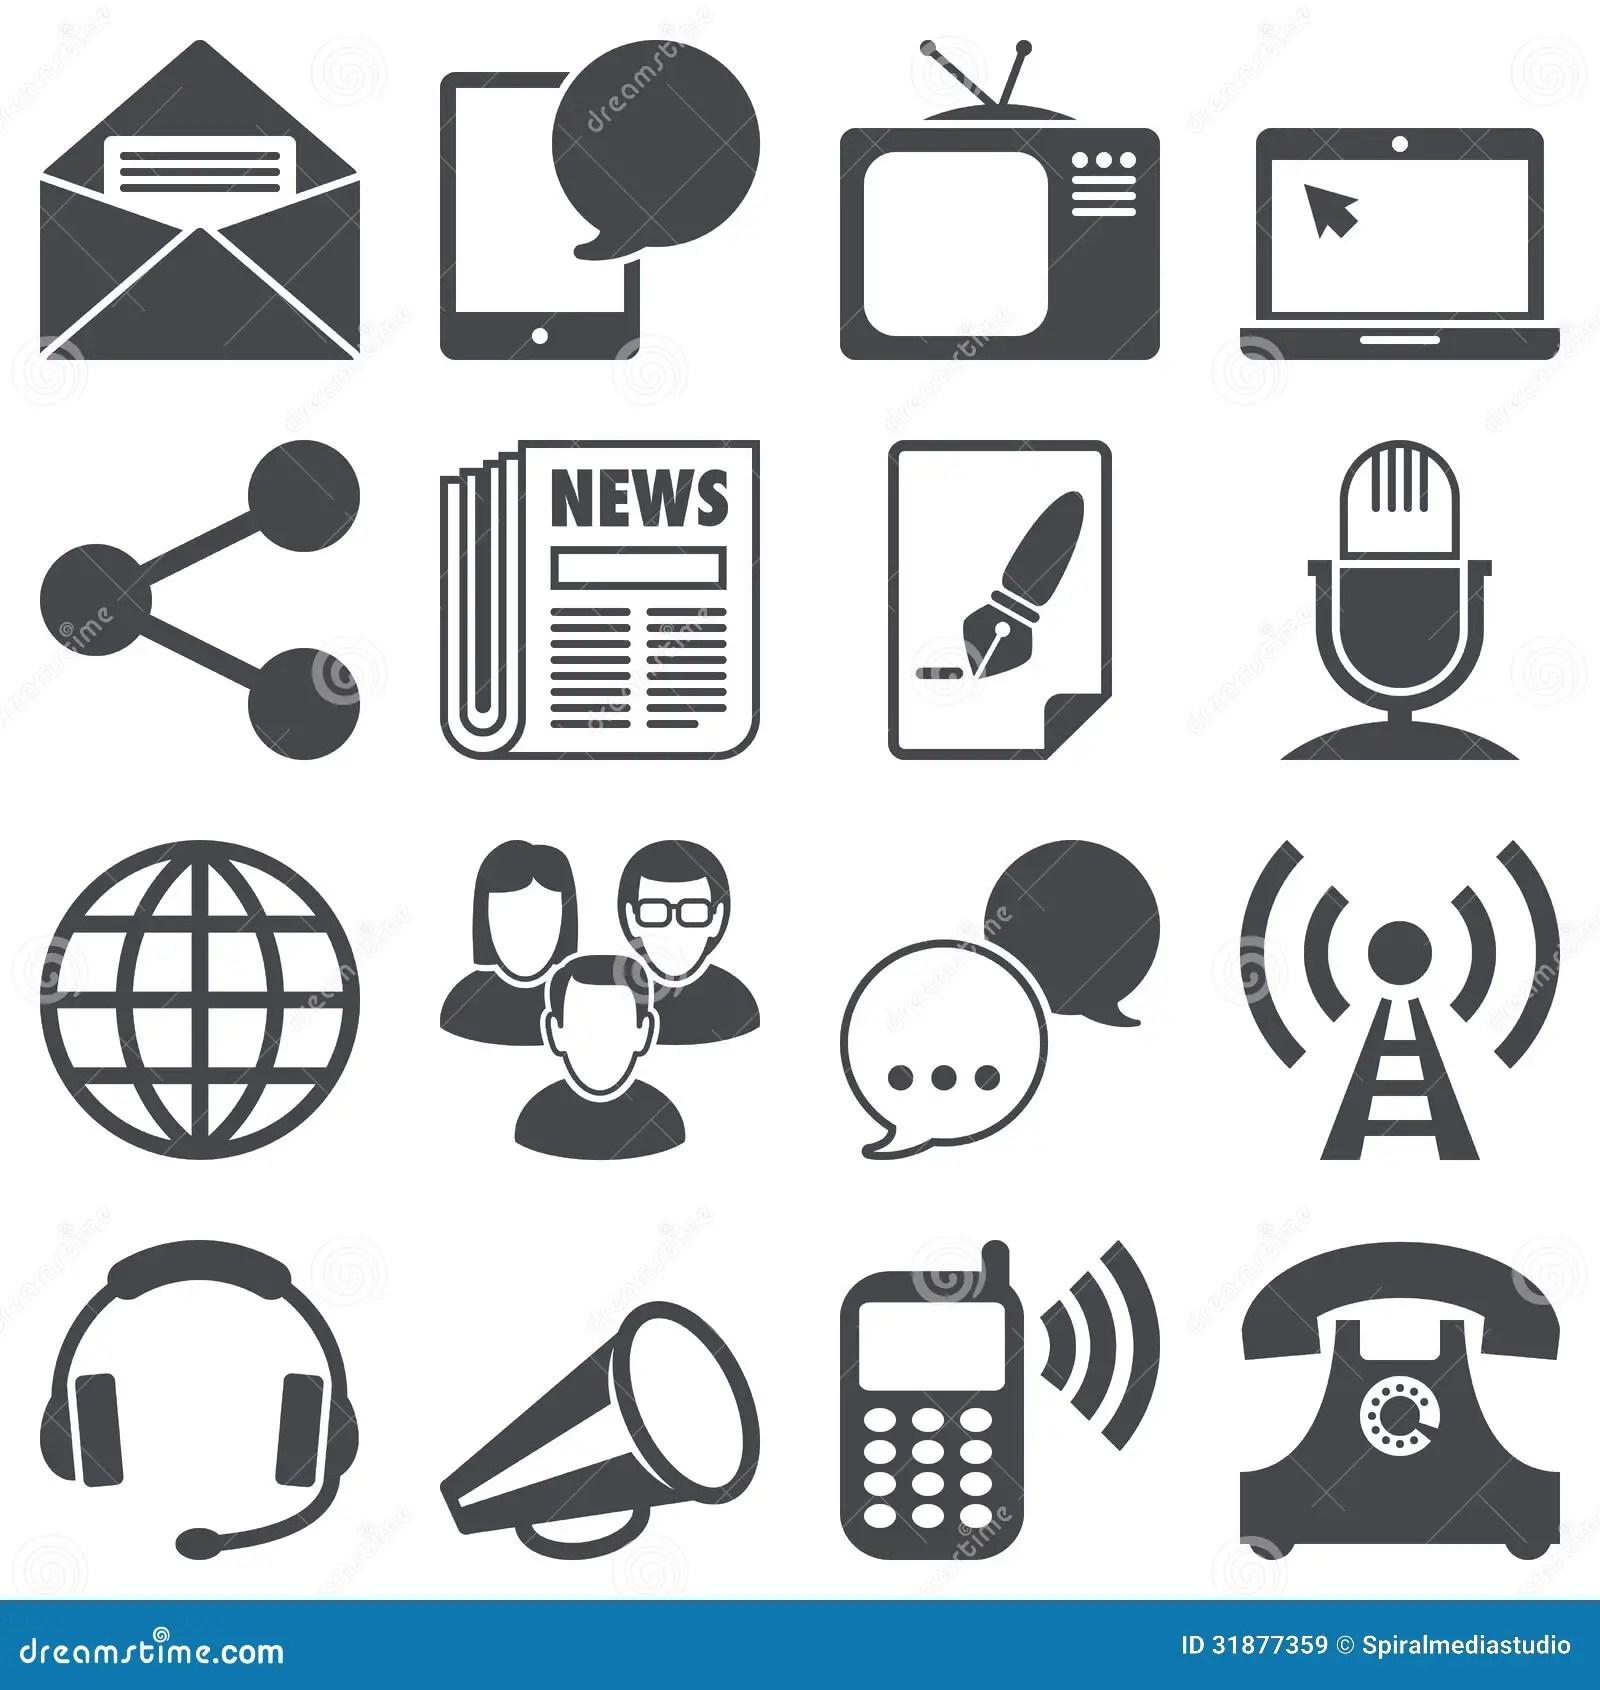 Communication Icons Royalty Free Stock Images